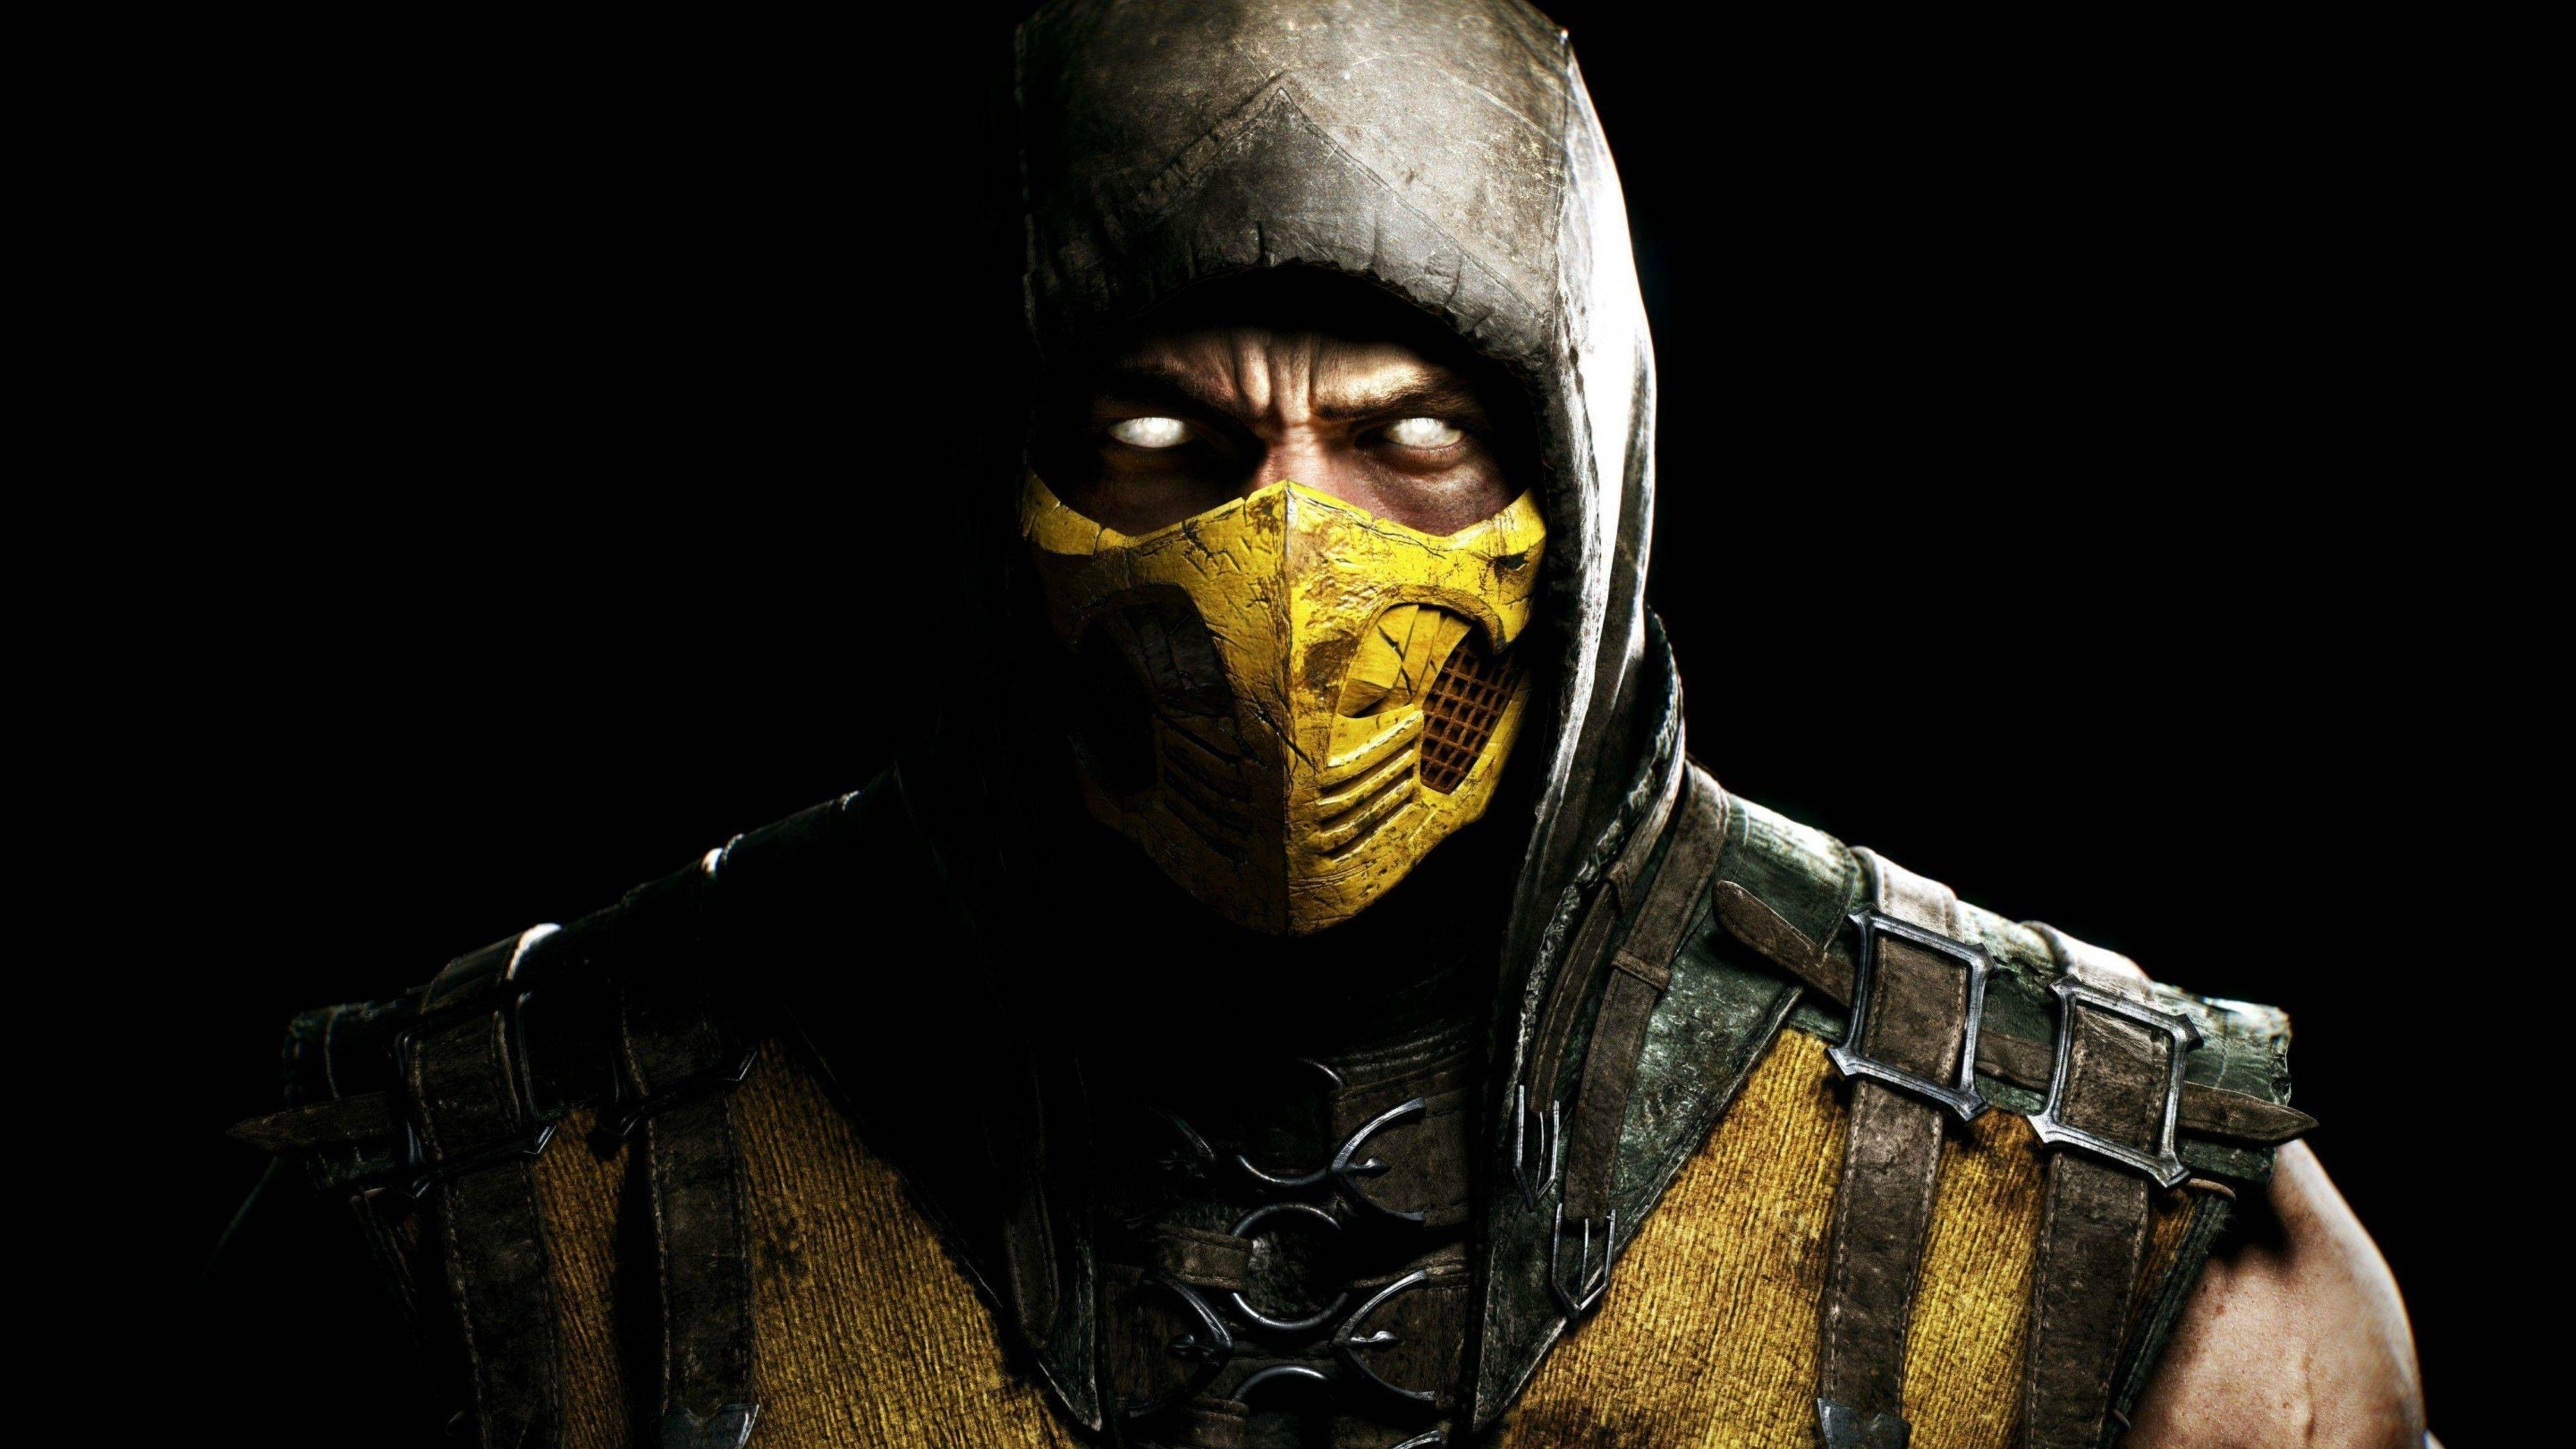 Download Scorpion In Mortal Kombat Hd K Wallpapers In X Scorpion Mortal Kombat Mortal Kombat X Wallpapers Mortal Kombat